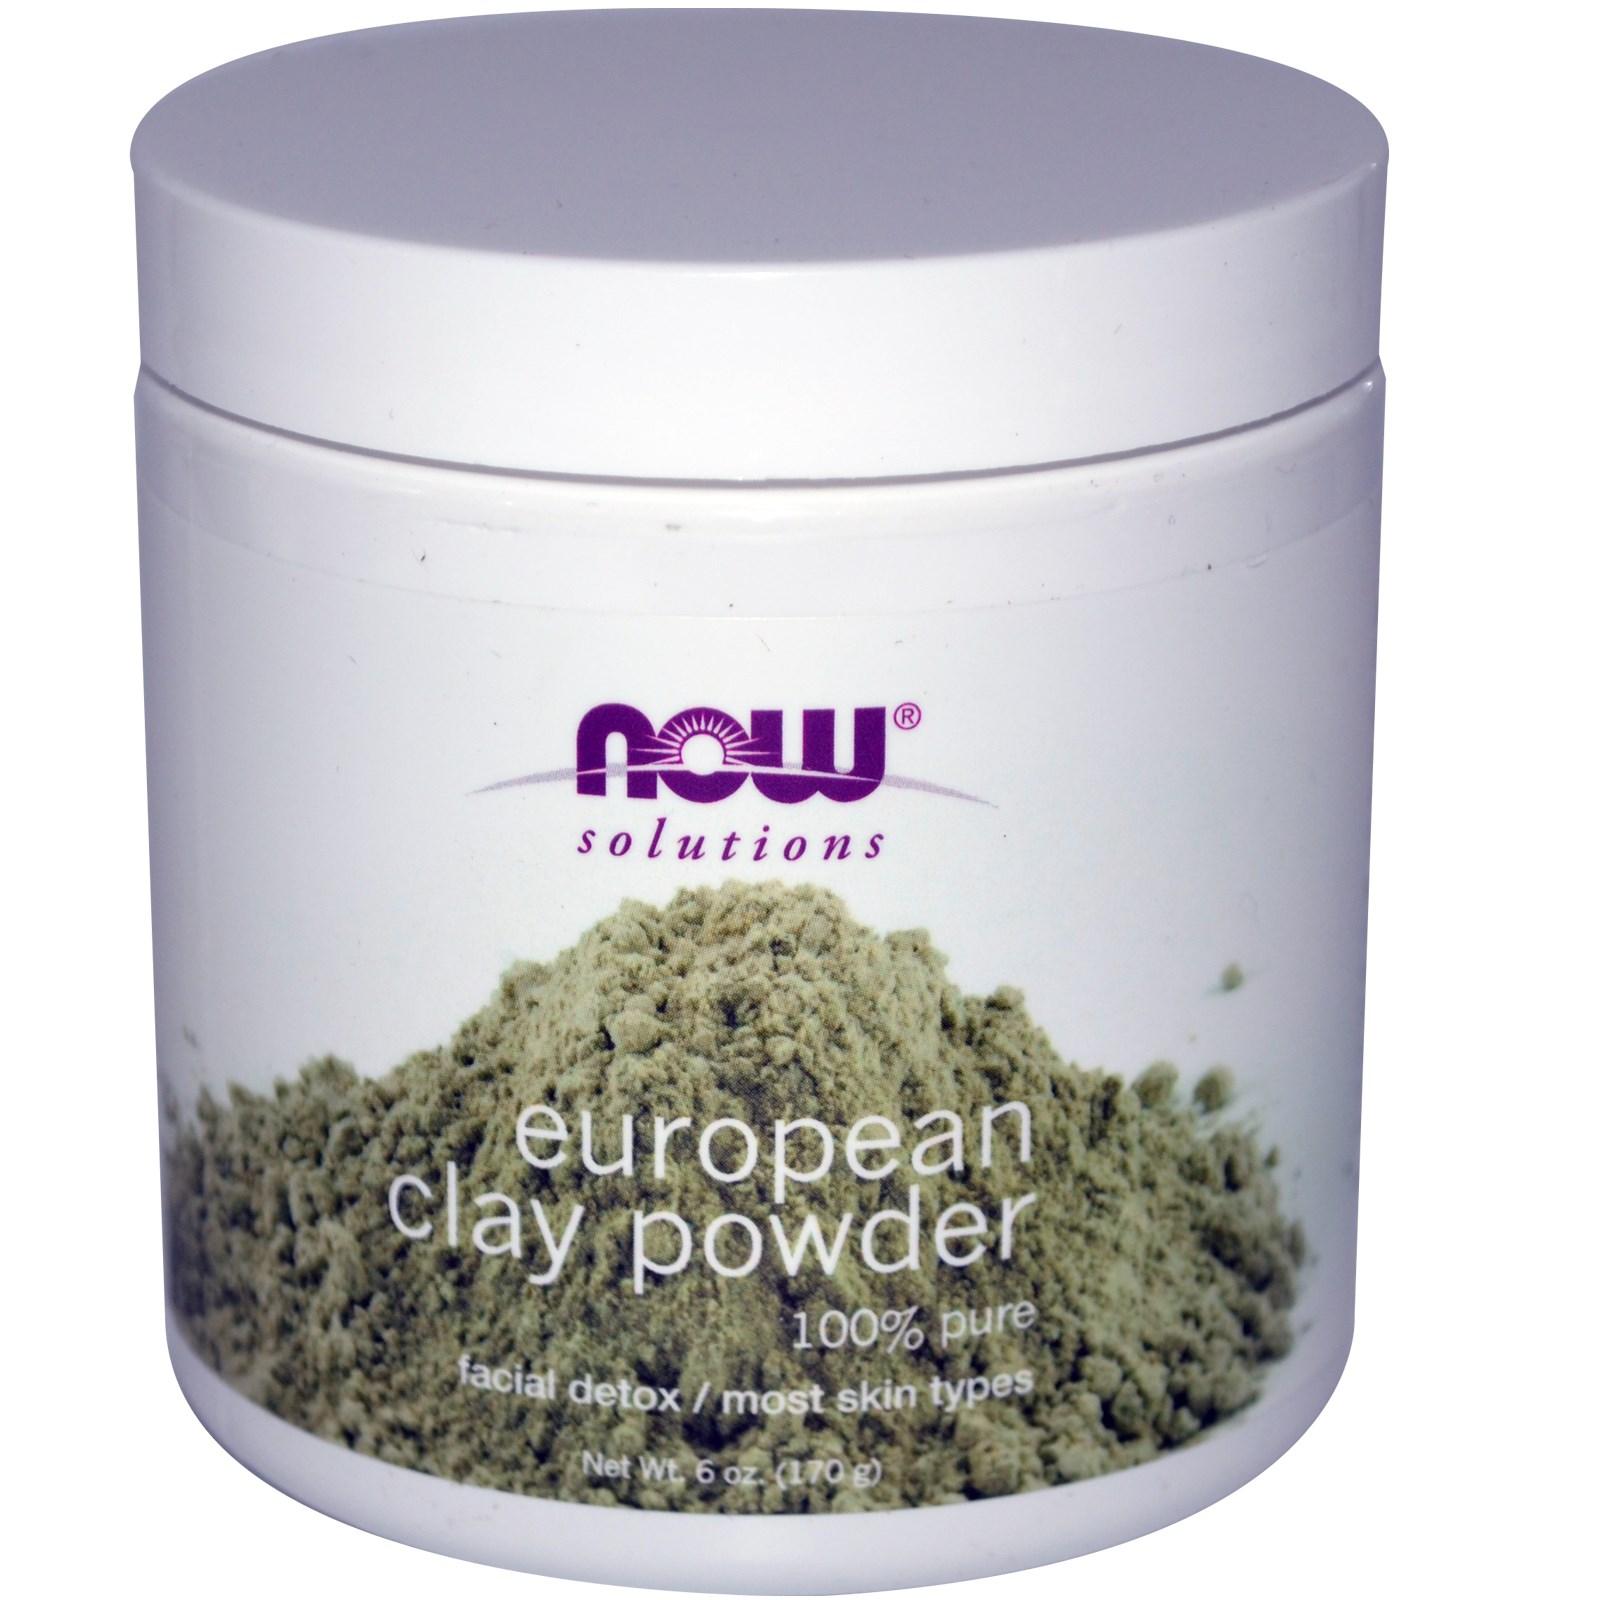 Image of European Clay Powder (170 gram) - Now Foods